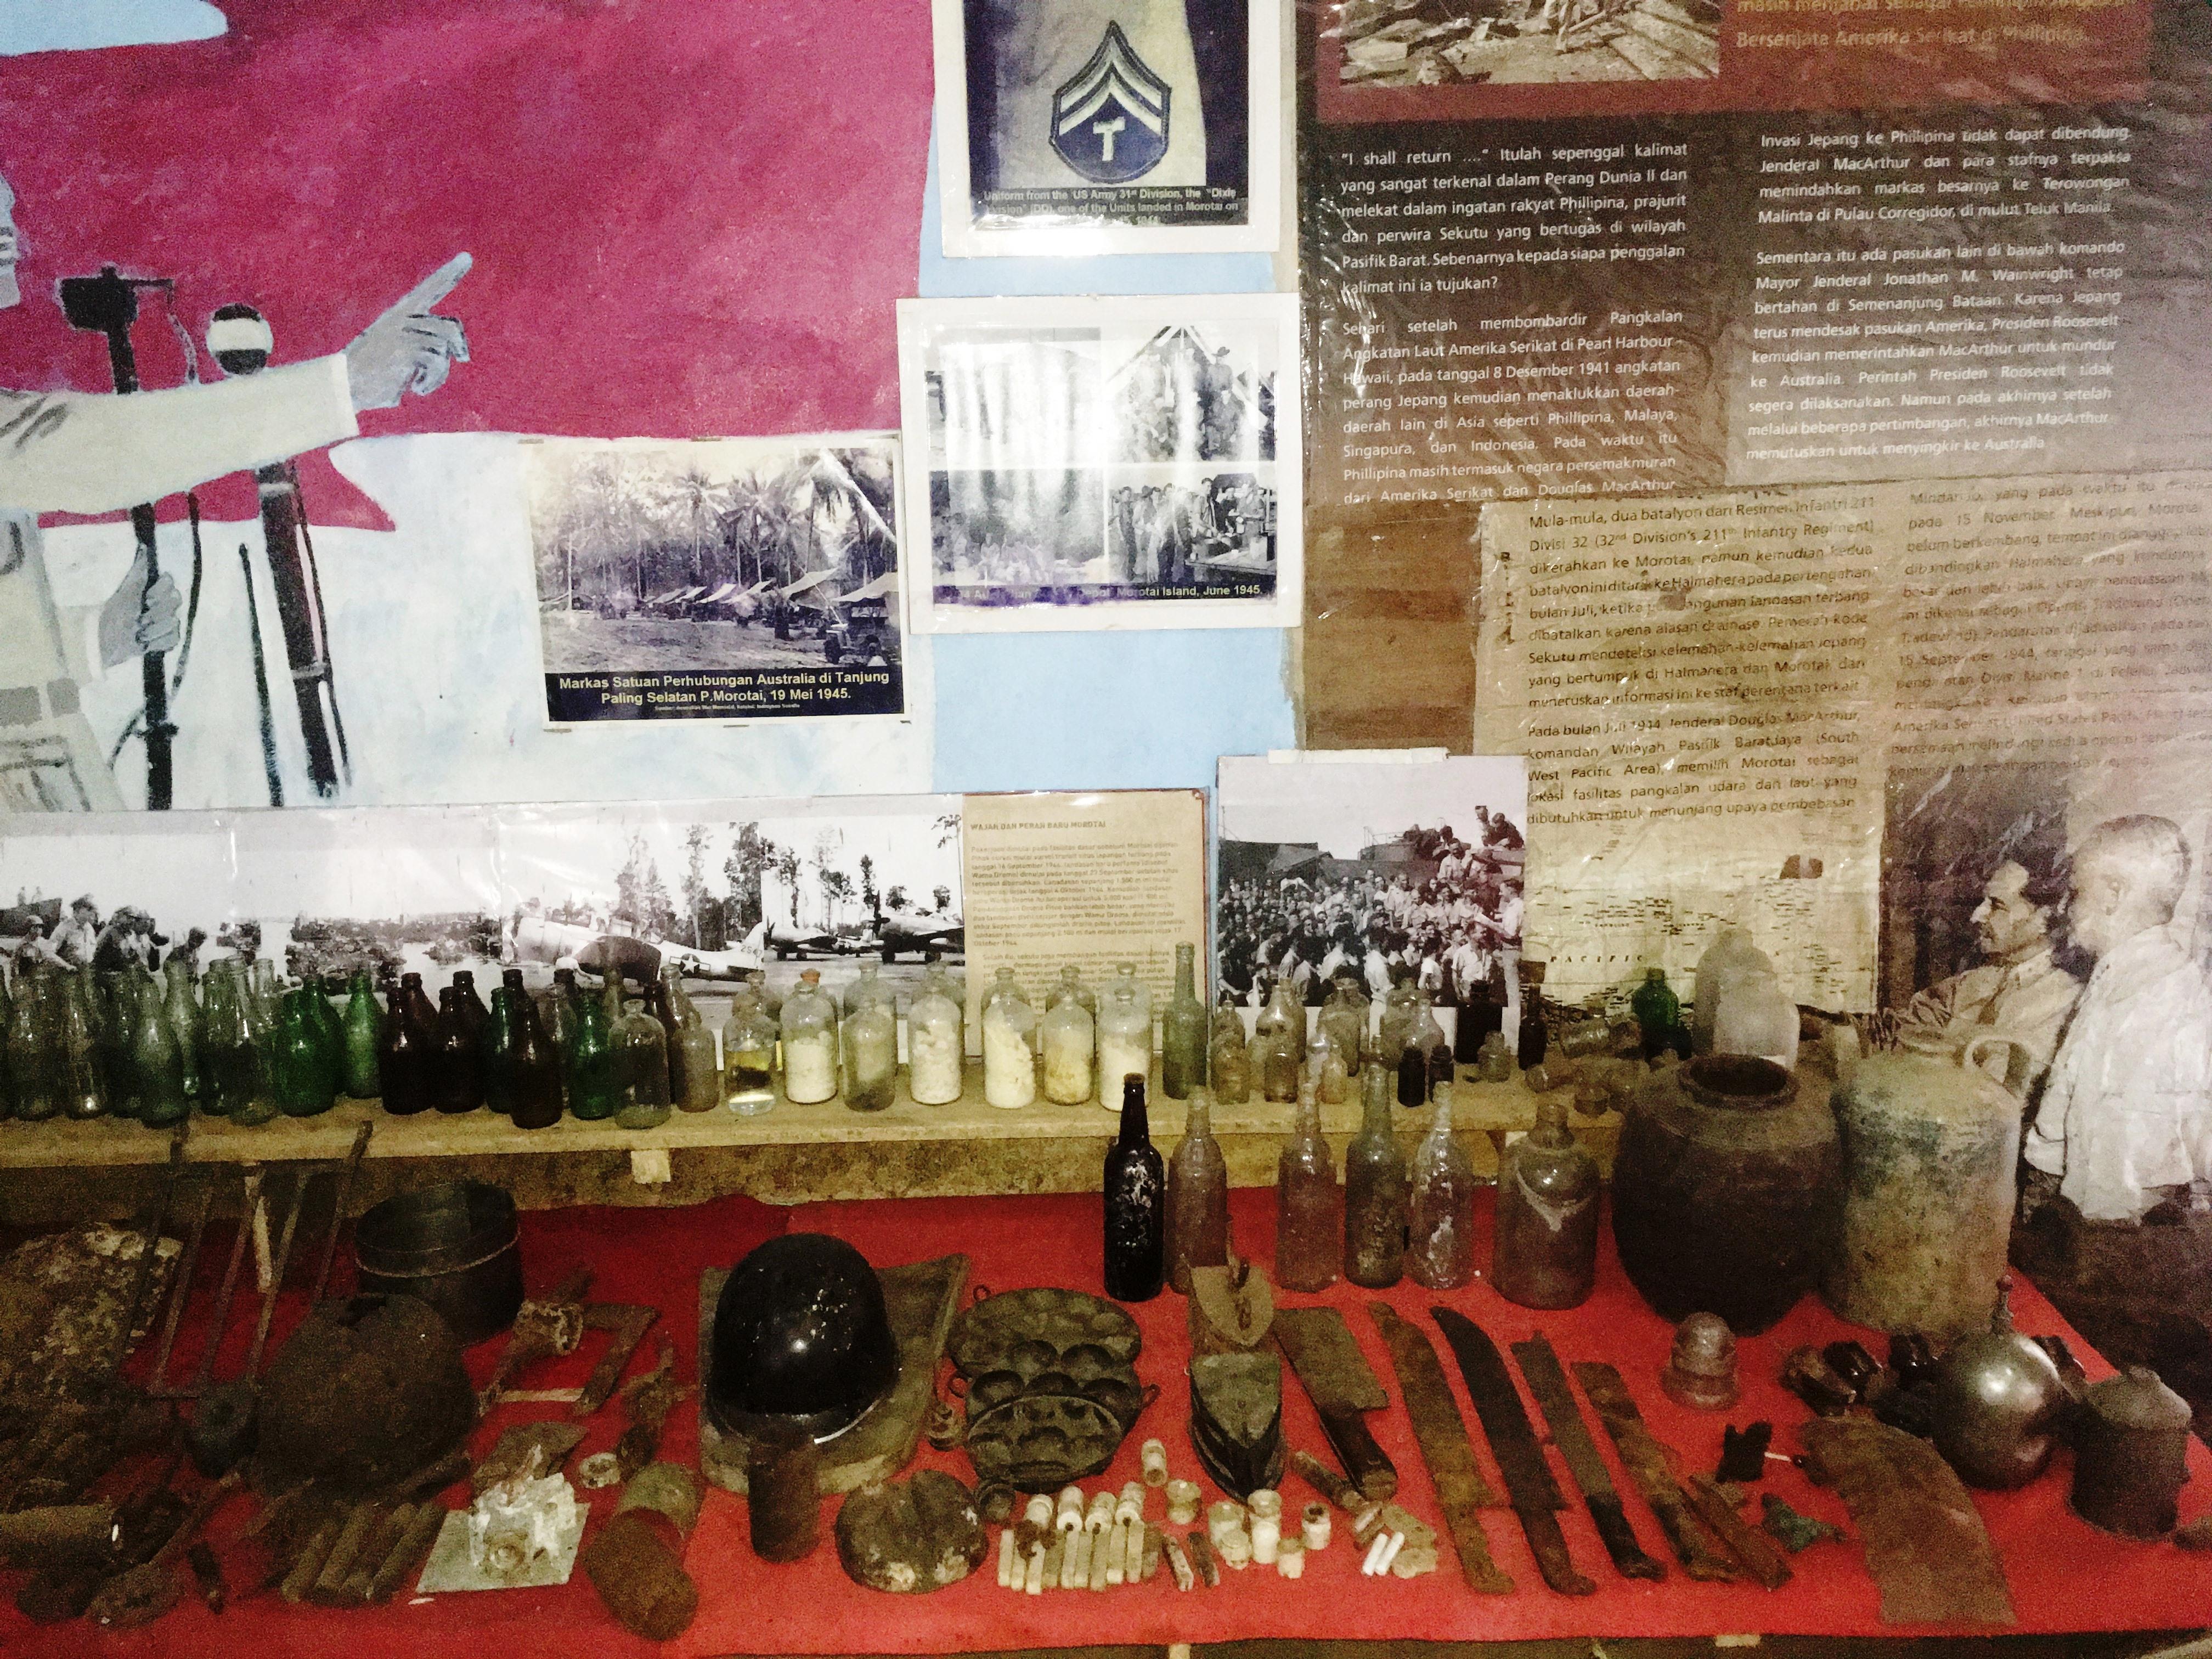 Gunung-Sabatai-More-relics-from-WWII-Nick-Hughes-September-2019